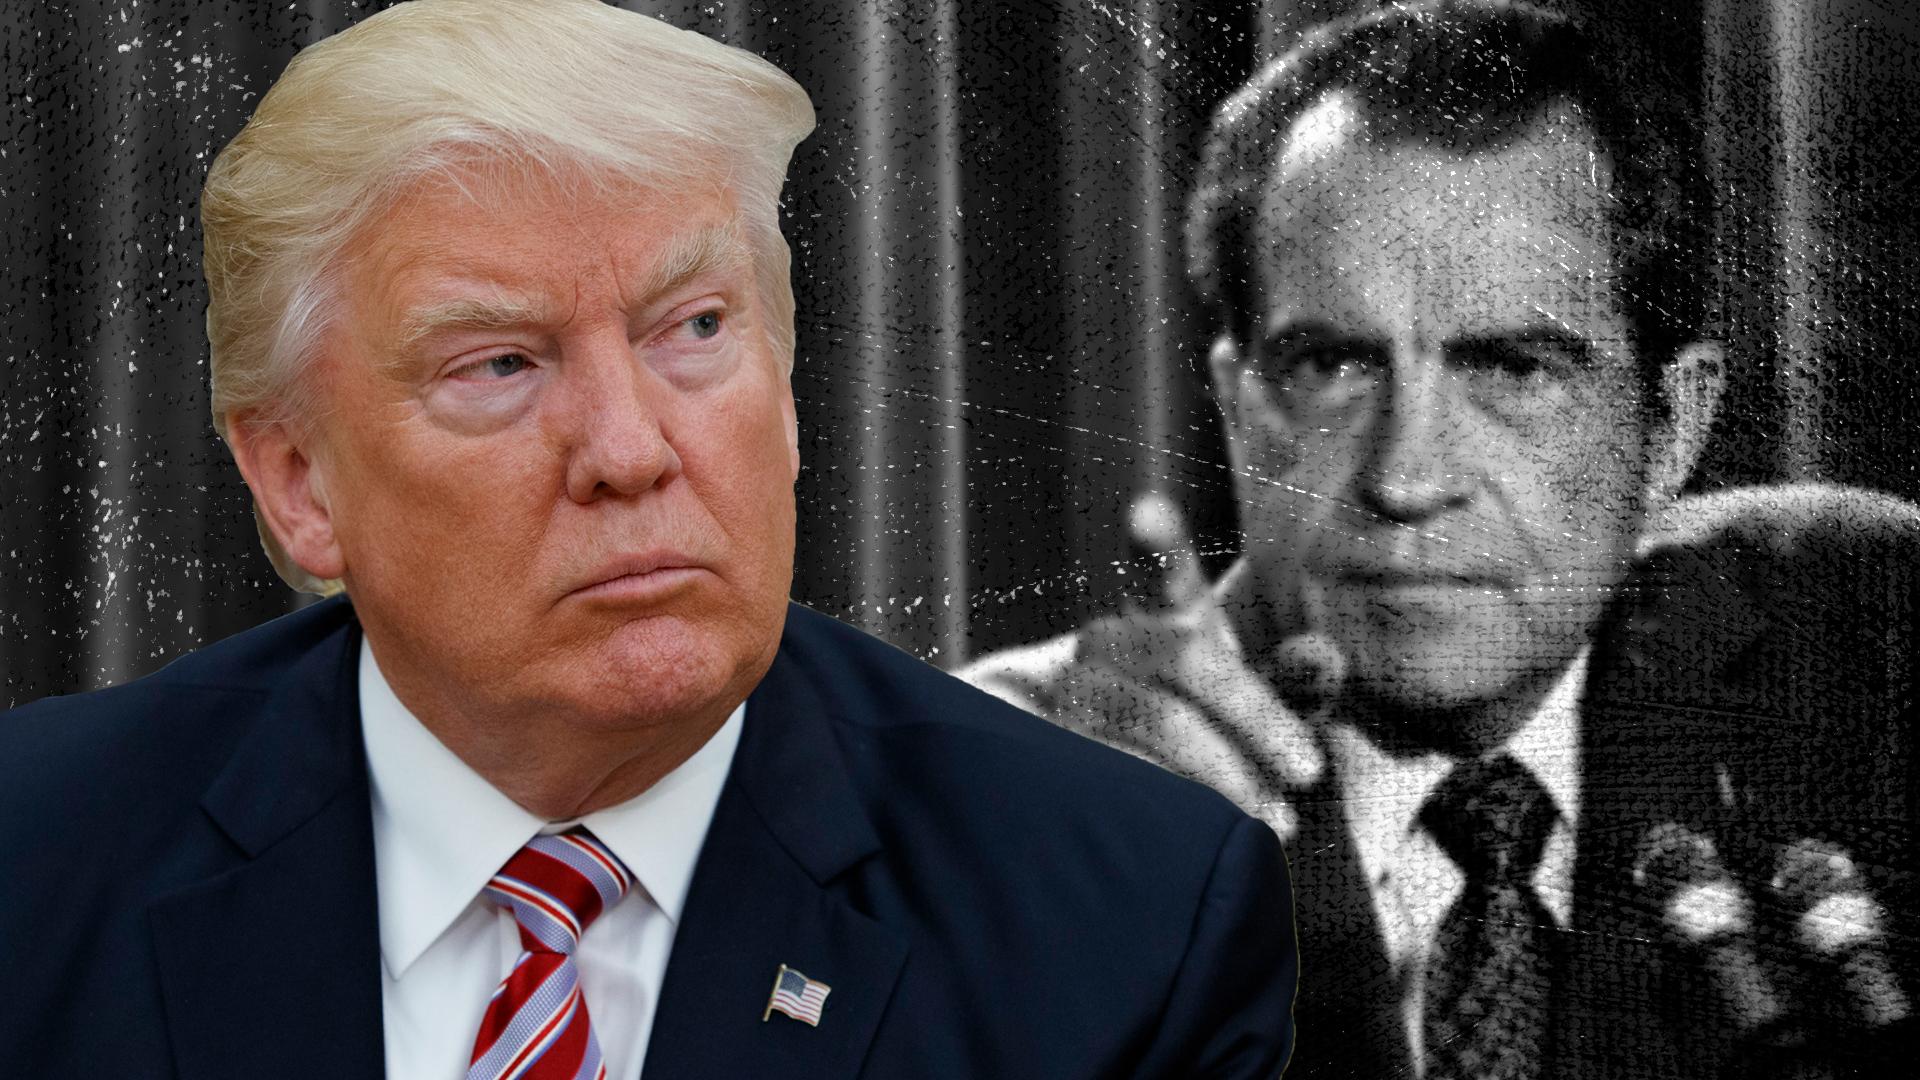 Mr. President, beware the mistakes of Richard Nixon